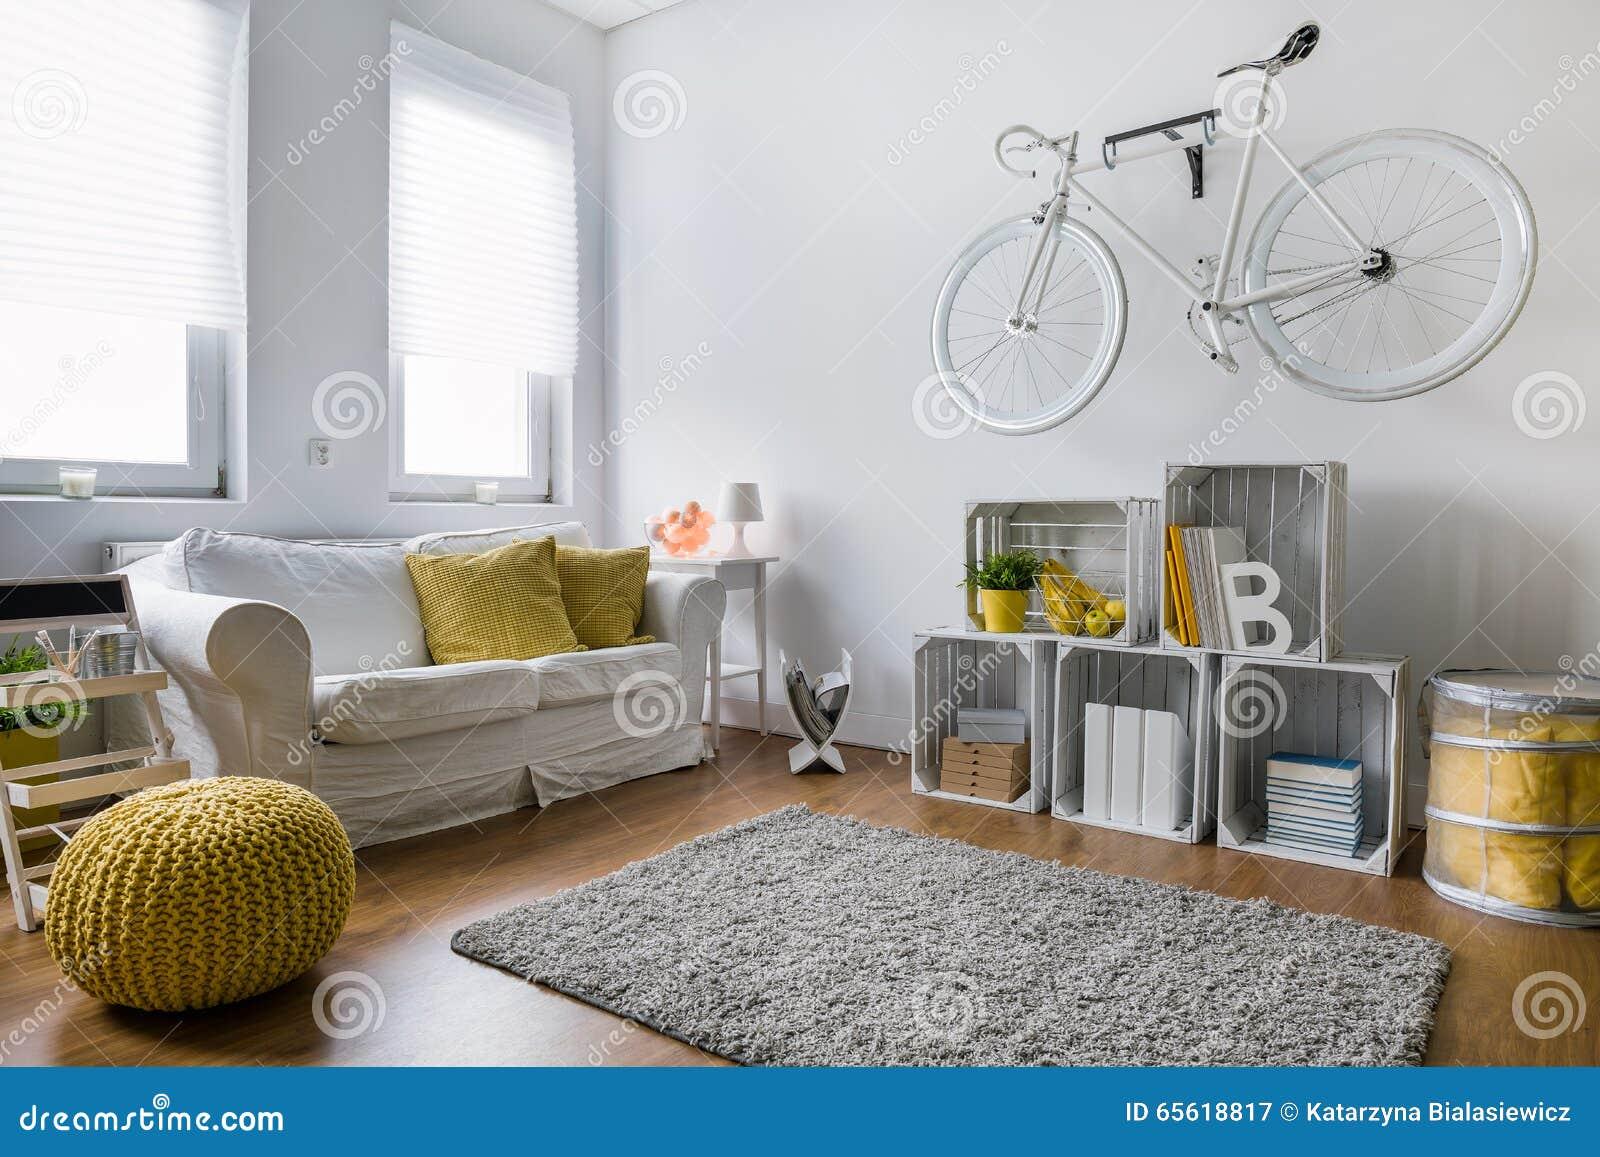 Kitchen Using Lifestyle Decorations Carpet Decor Style